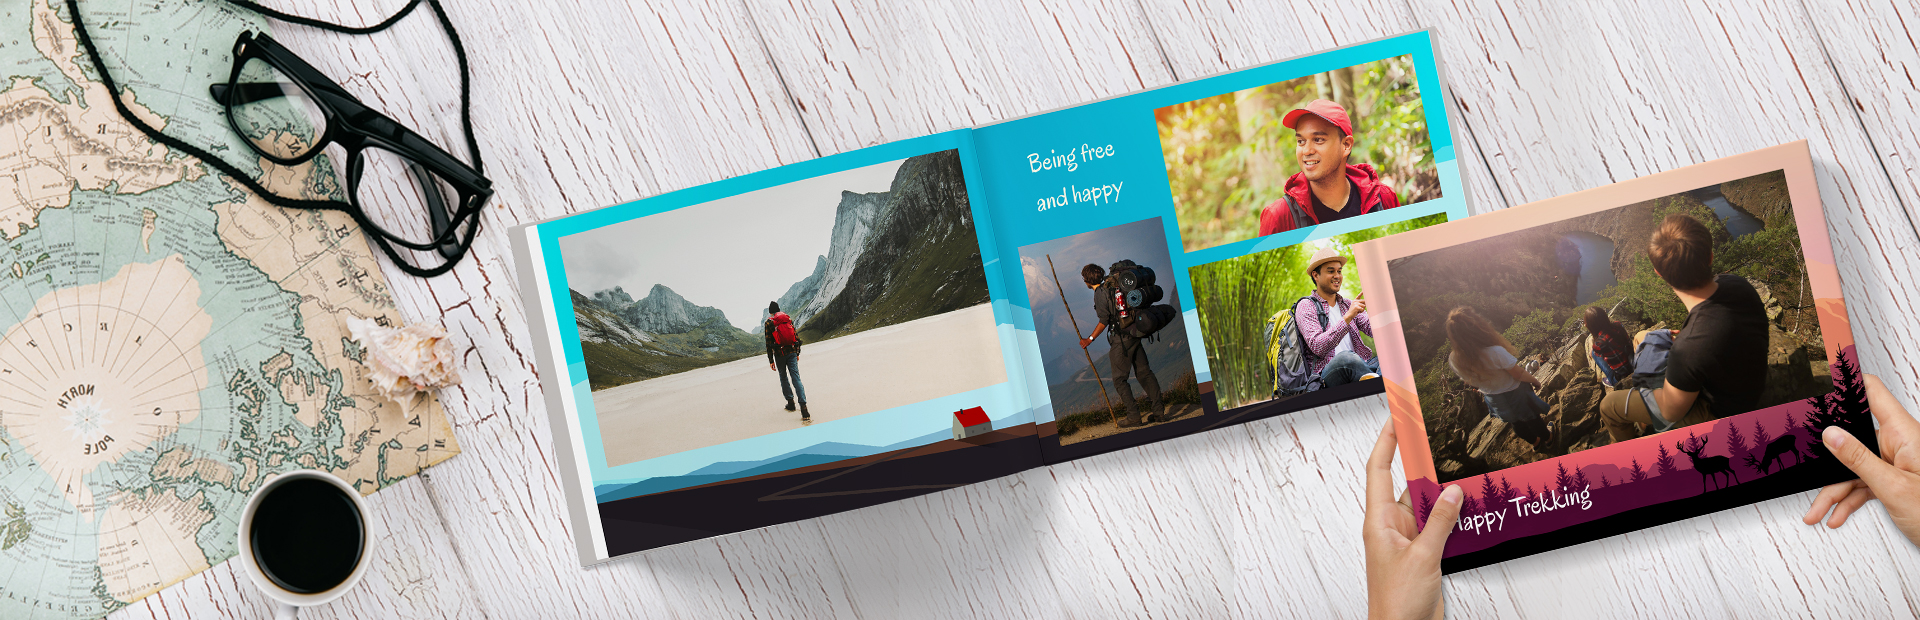 Mount Vacations Custom Photo Books